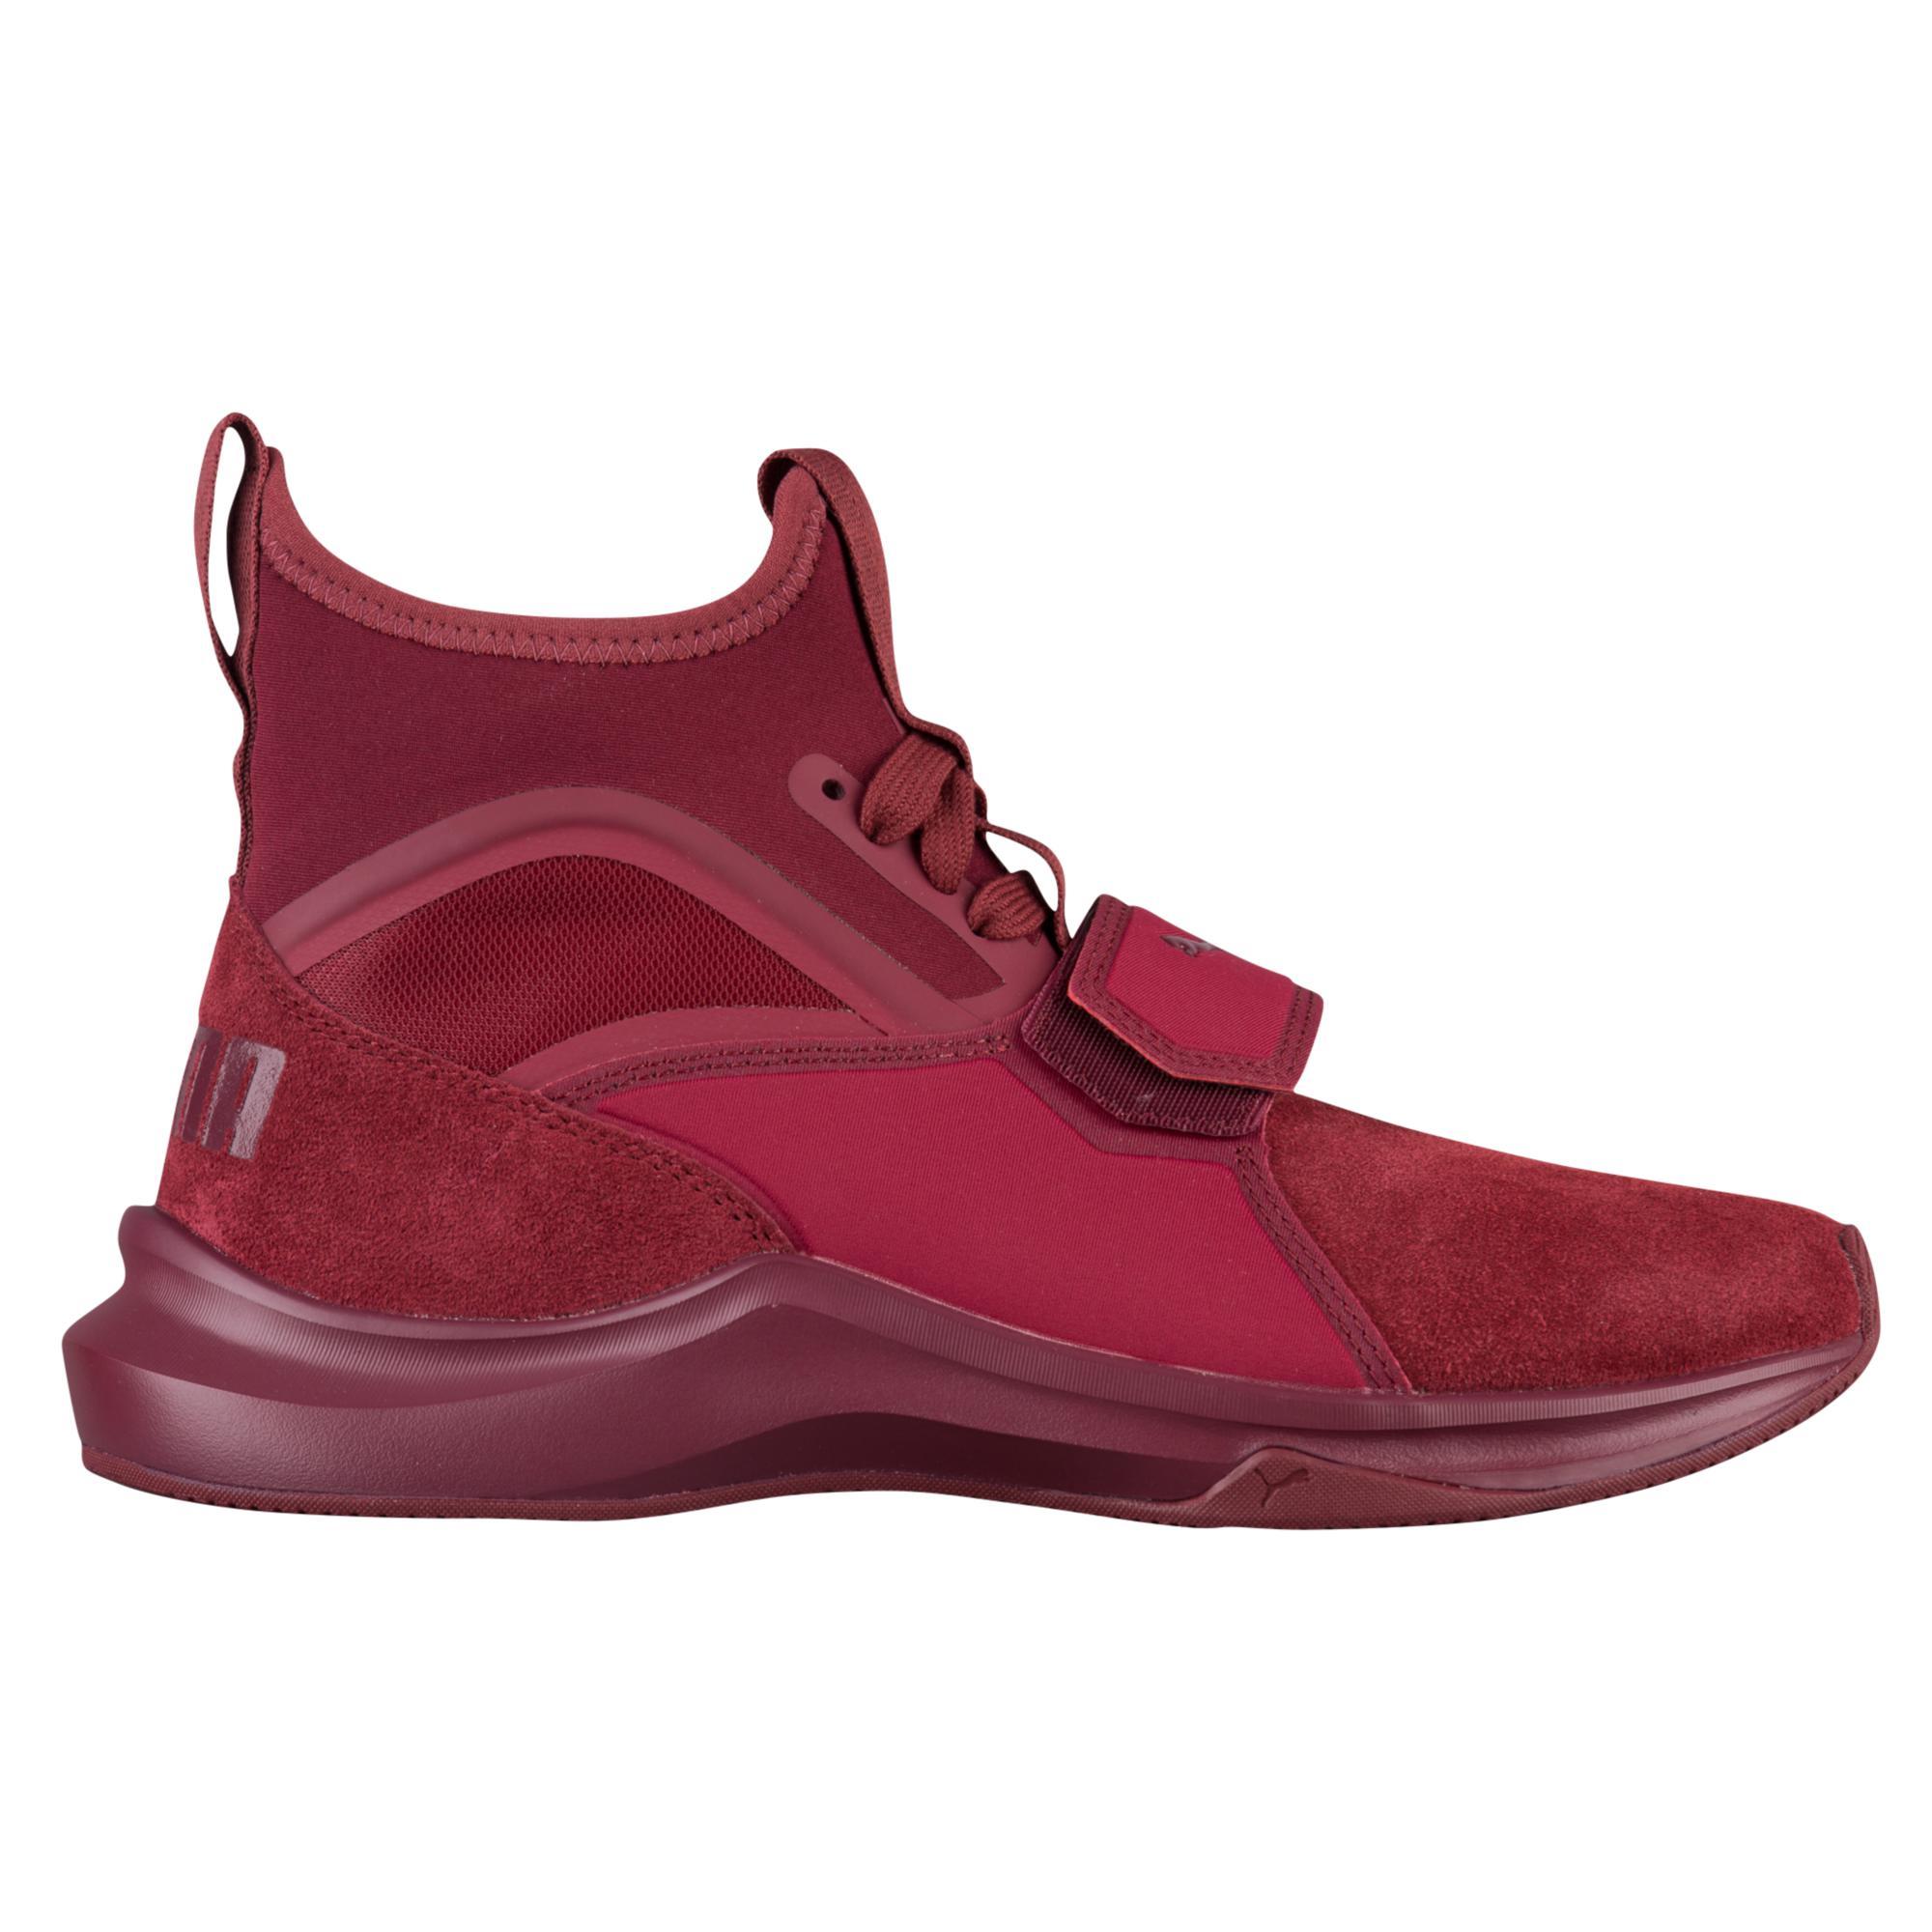 Lyst - Puma Phenom in Red for Men 9abc698ac